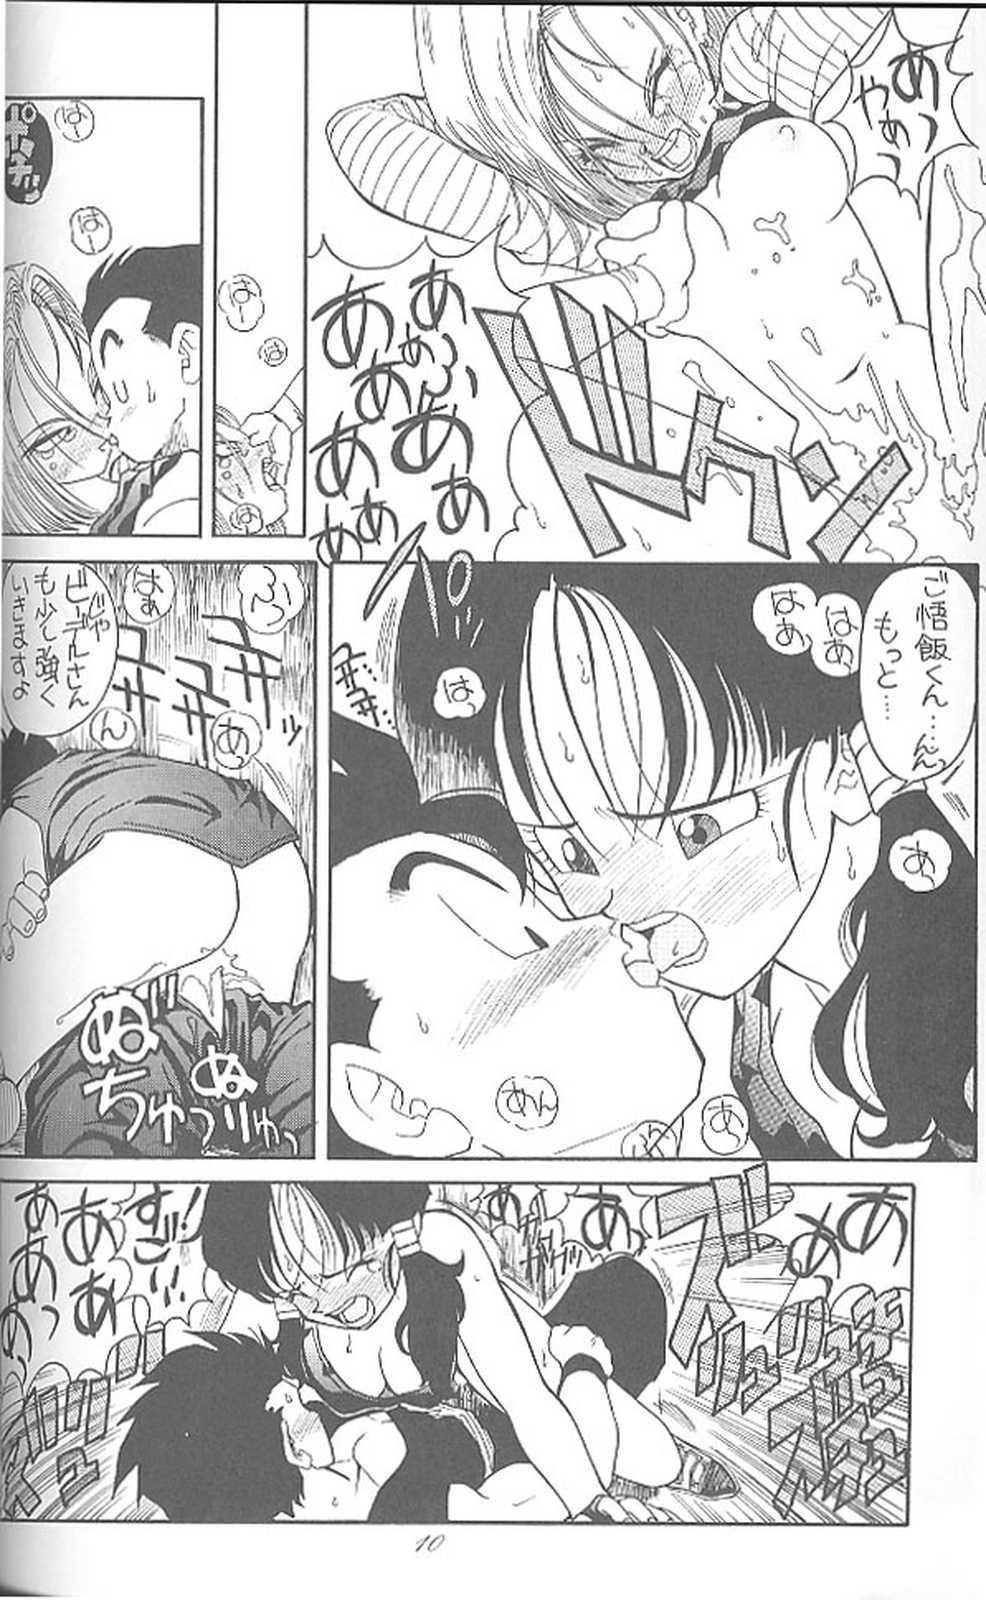 Haraharatokei vol.4 8